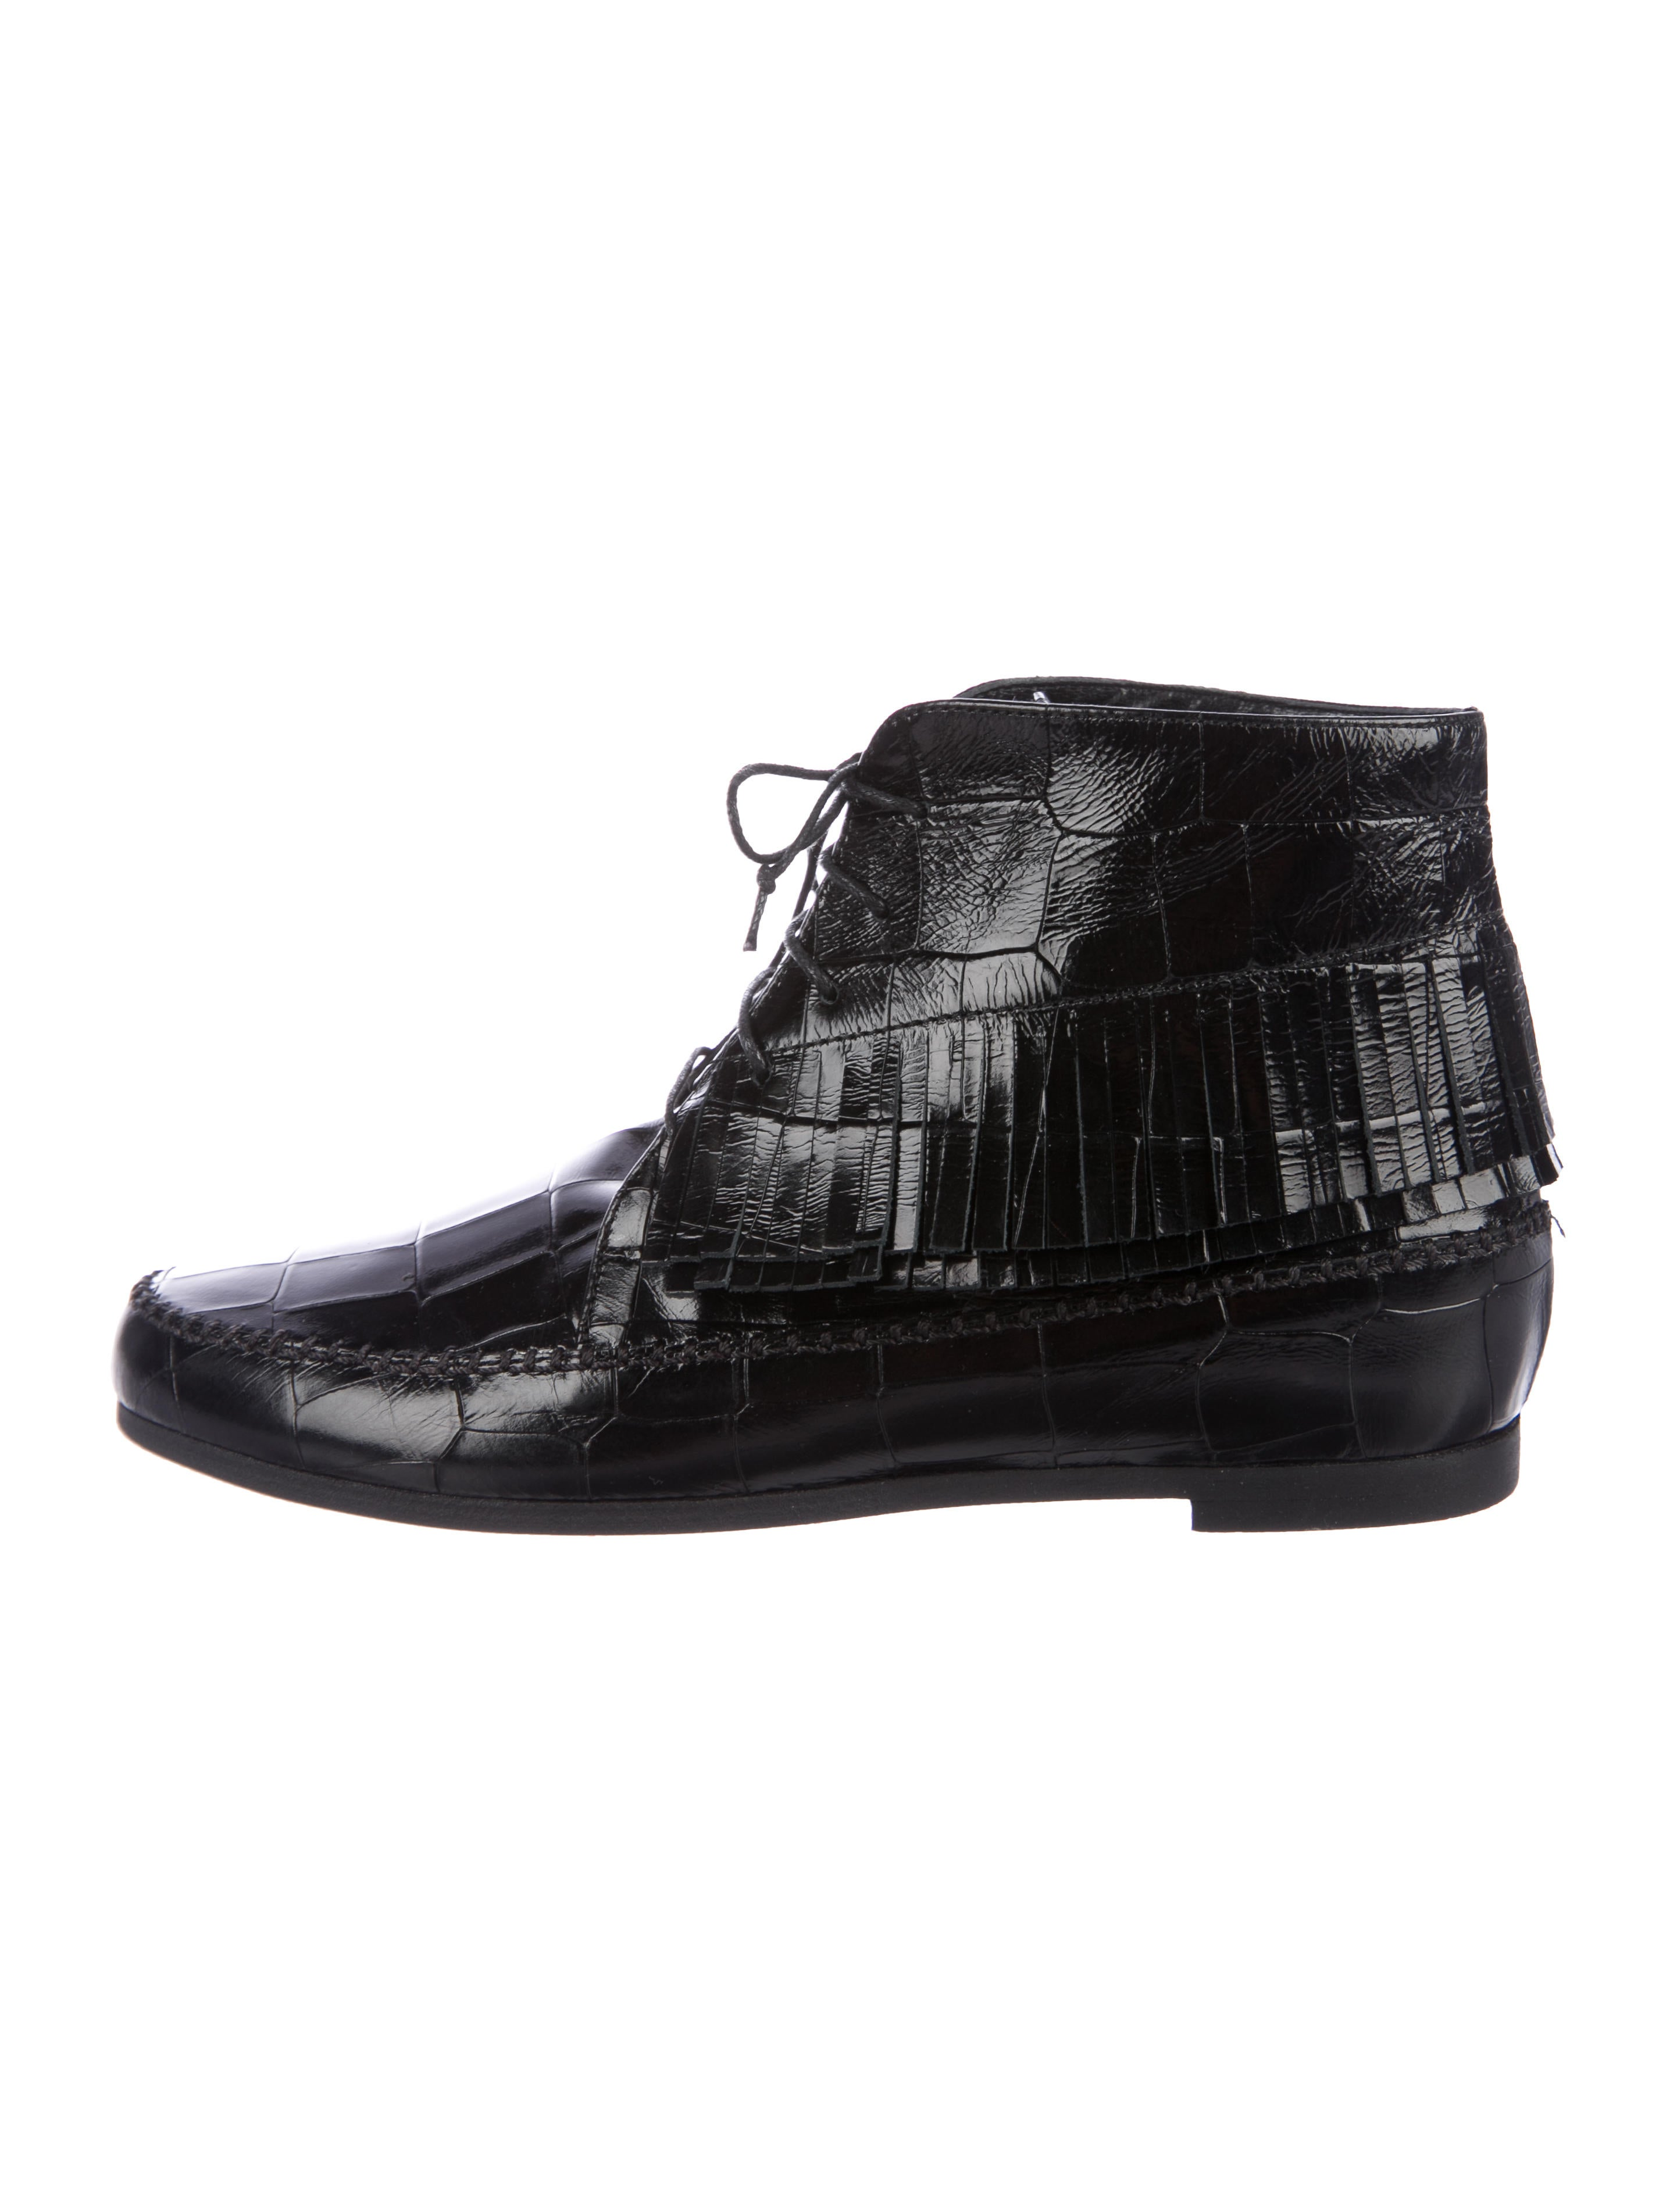 Jenni Kayne Embossed Leather Booties buy cheap real 2Uj6phQA